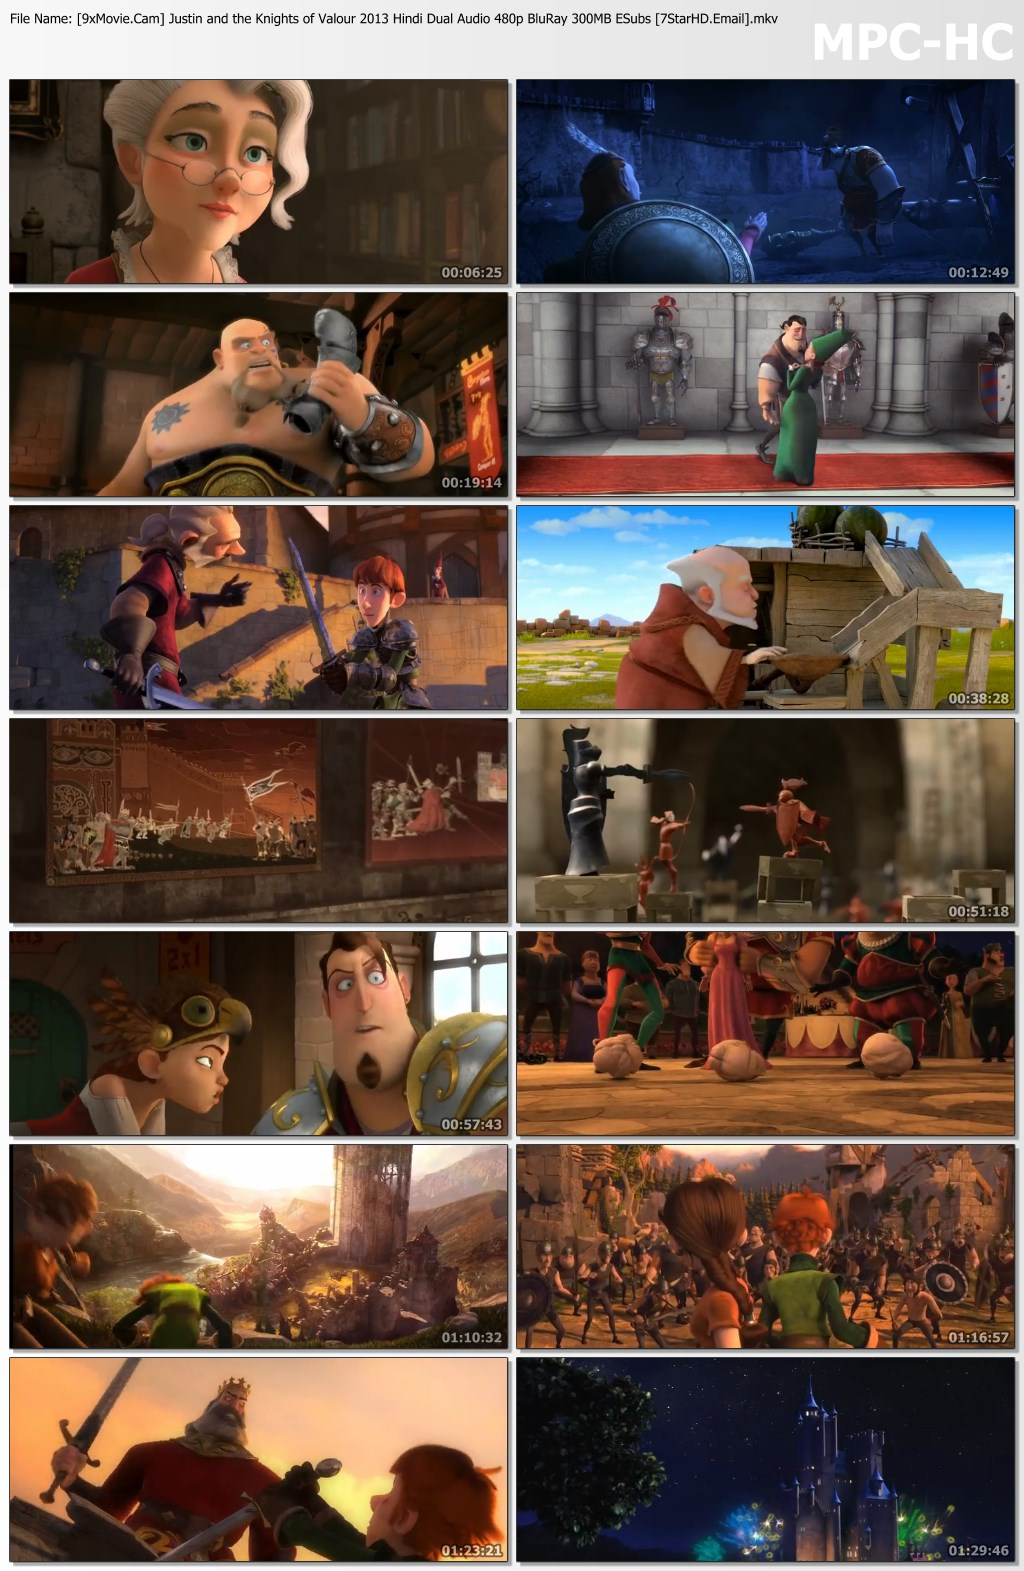 Justin and the Knights of Valour 2013 Hindi Dual Audio 480p BluRay 300MB ESubs